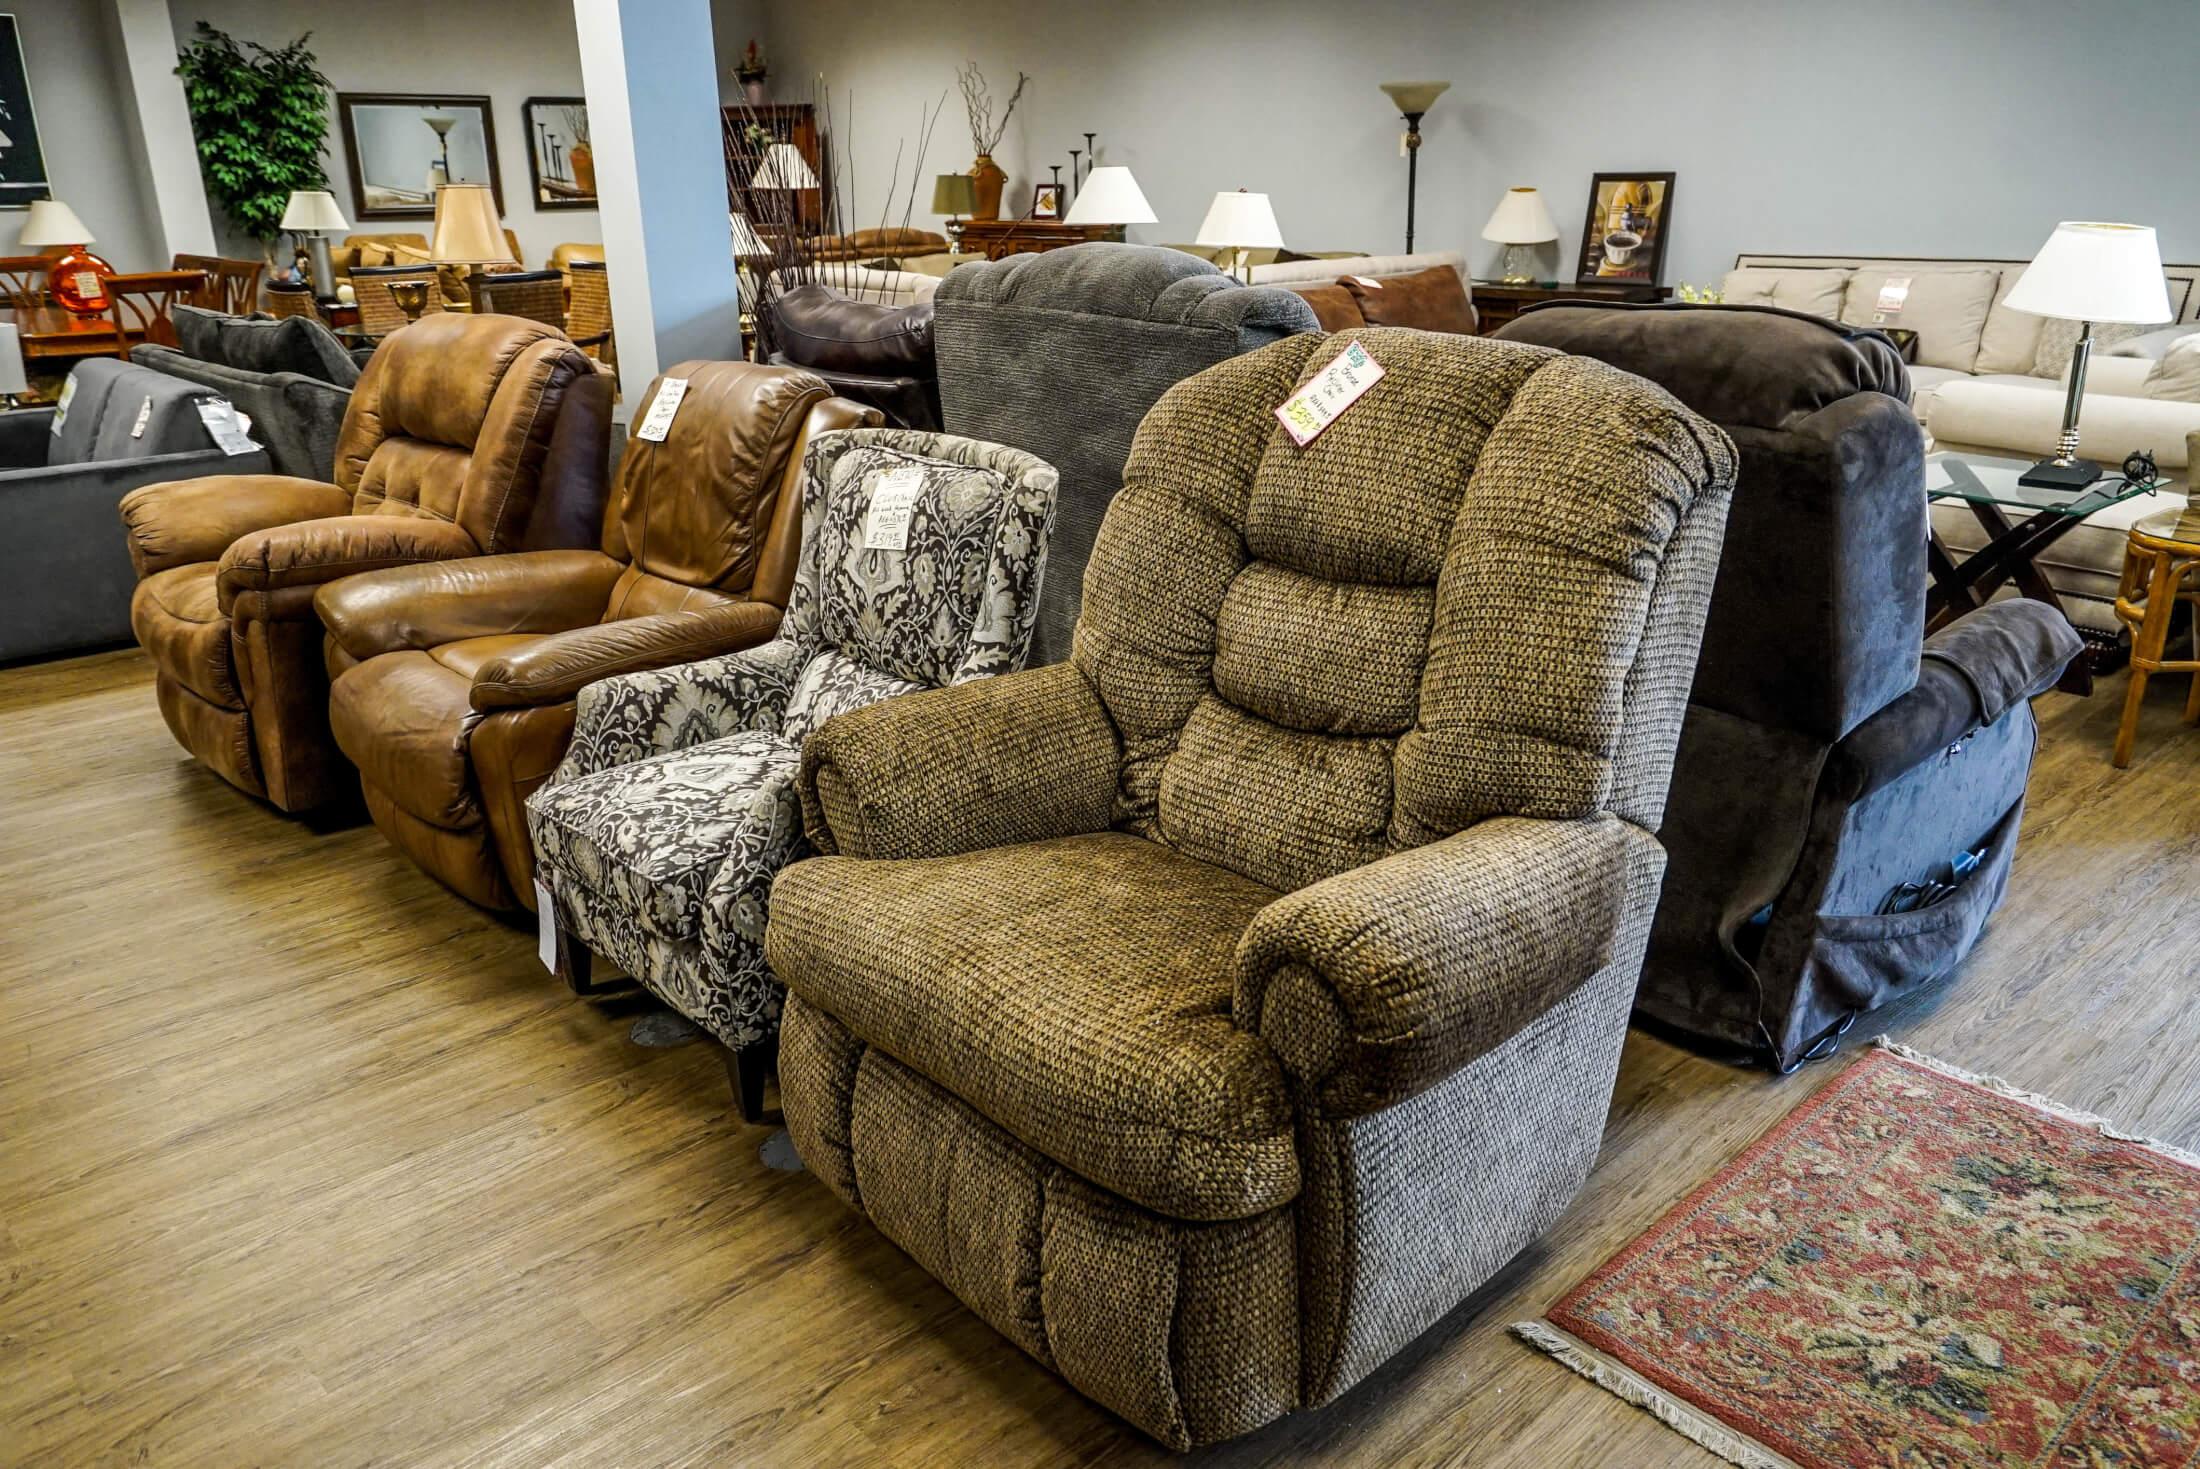 Houston Furniture Bank's Outlet Center